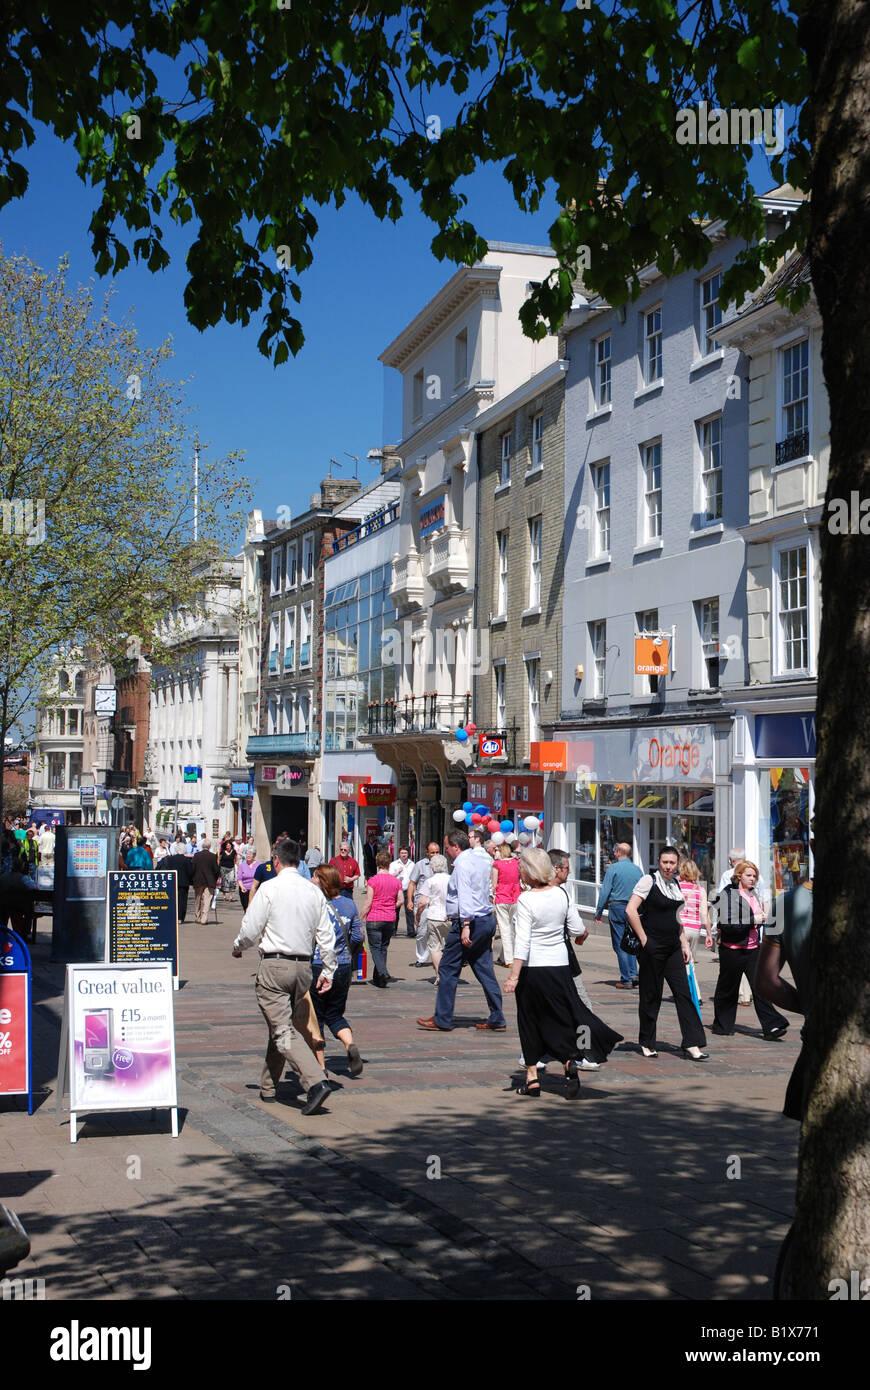 Shoppers on Gentleman's Walk, Norwich - Stock Image